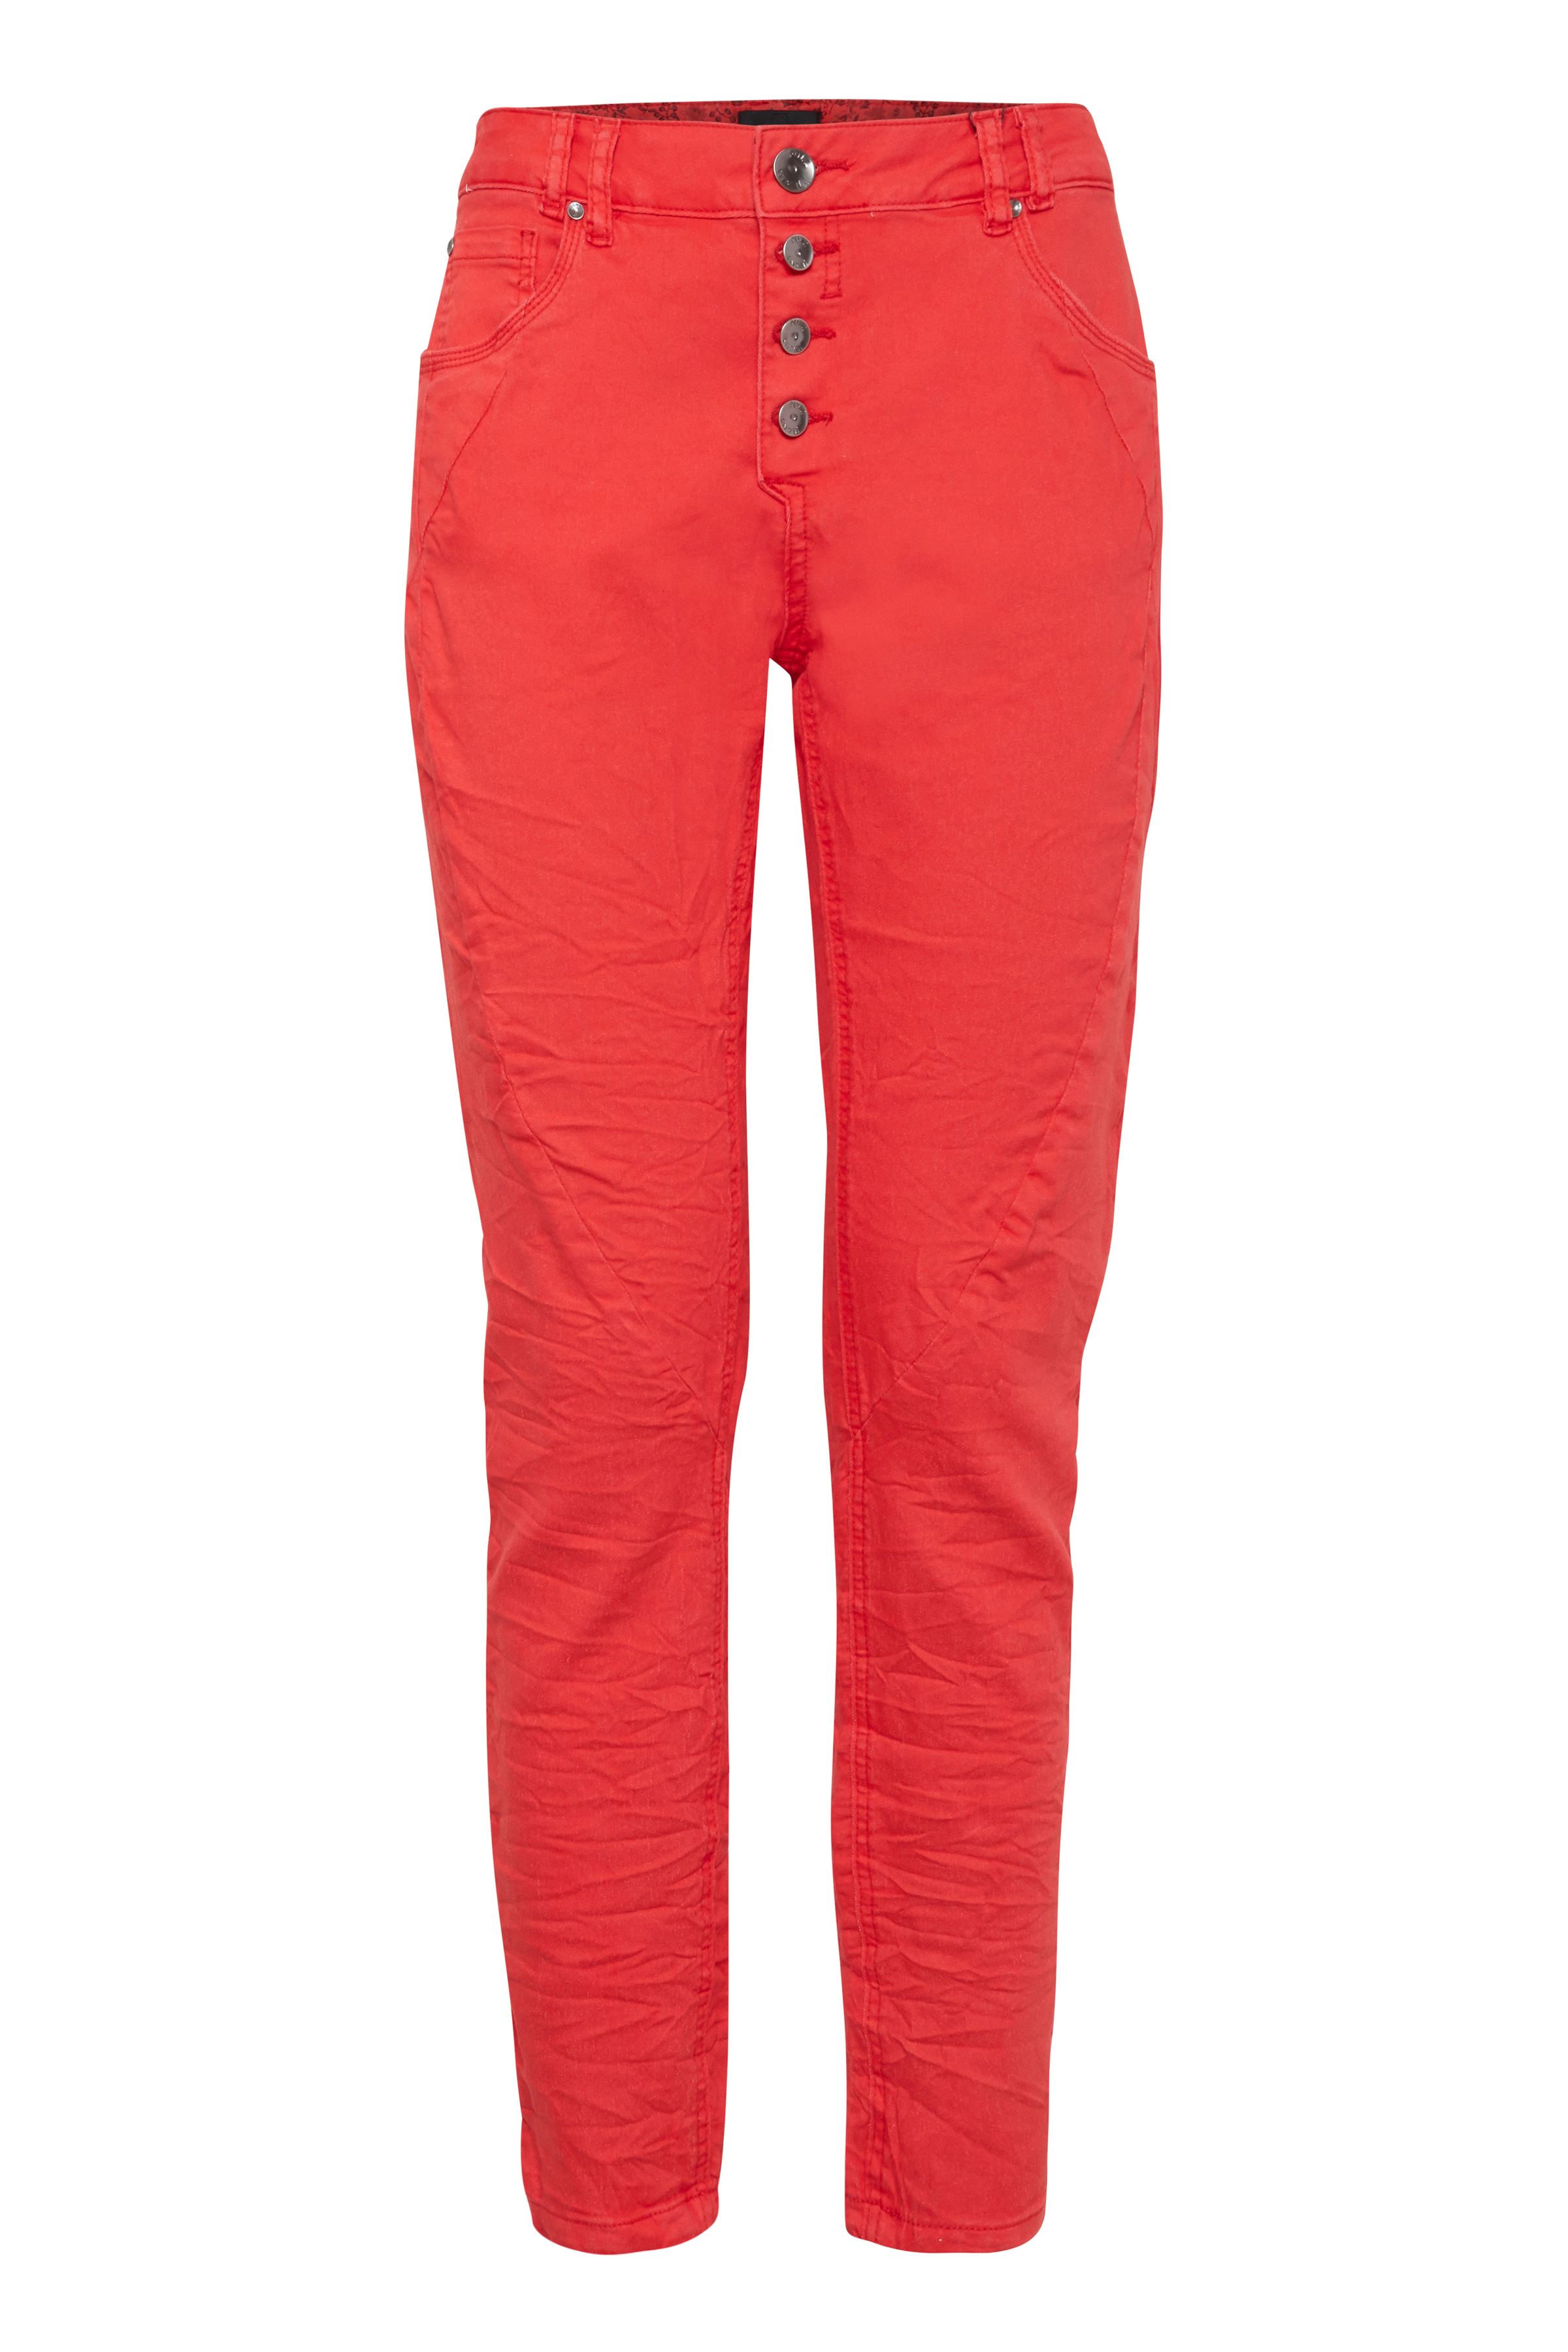 Image of Pulz Jeans Dame 5-lommet Rosita ankelbukser - Rød